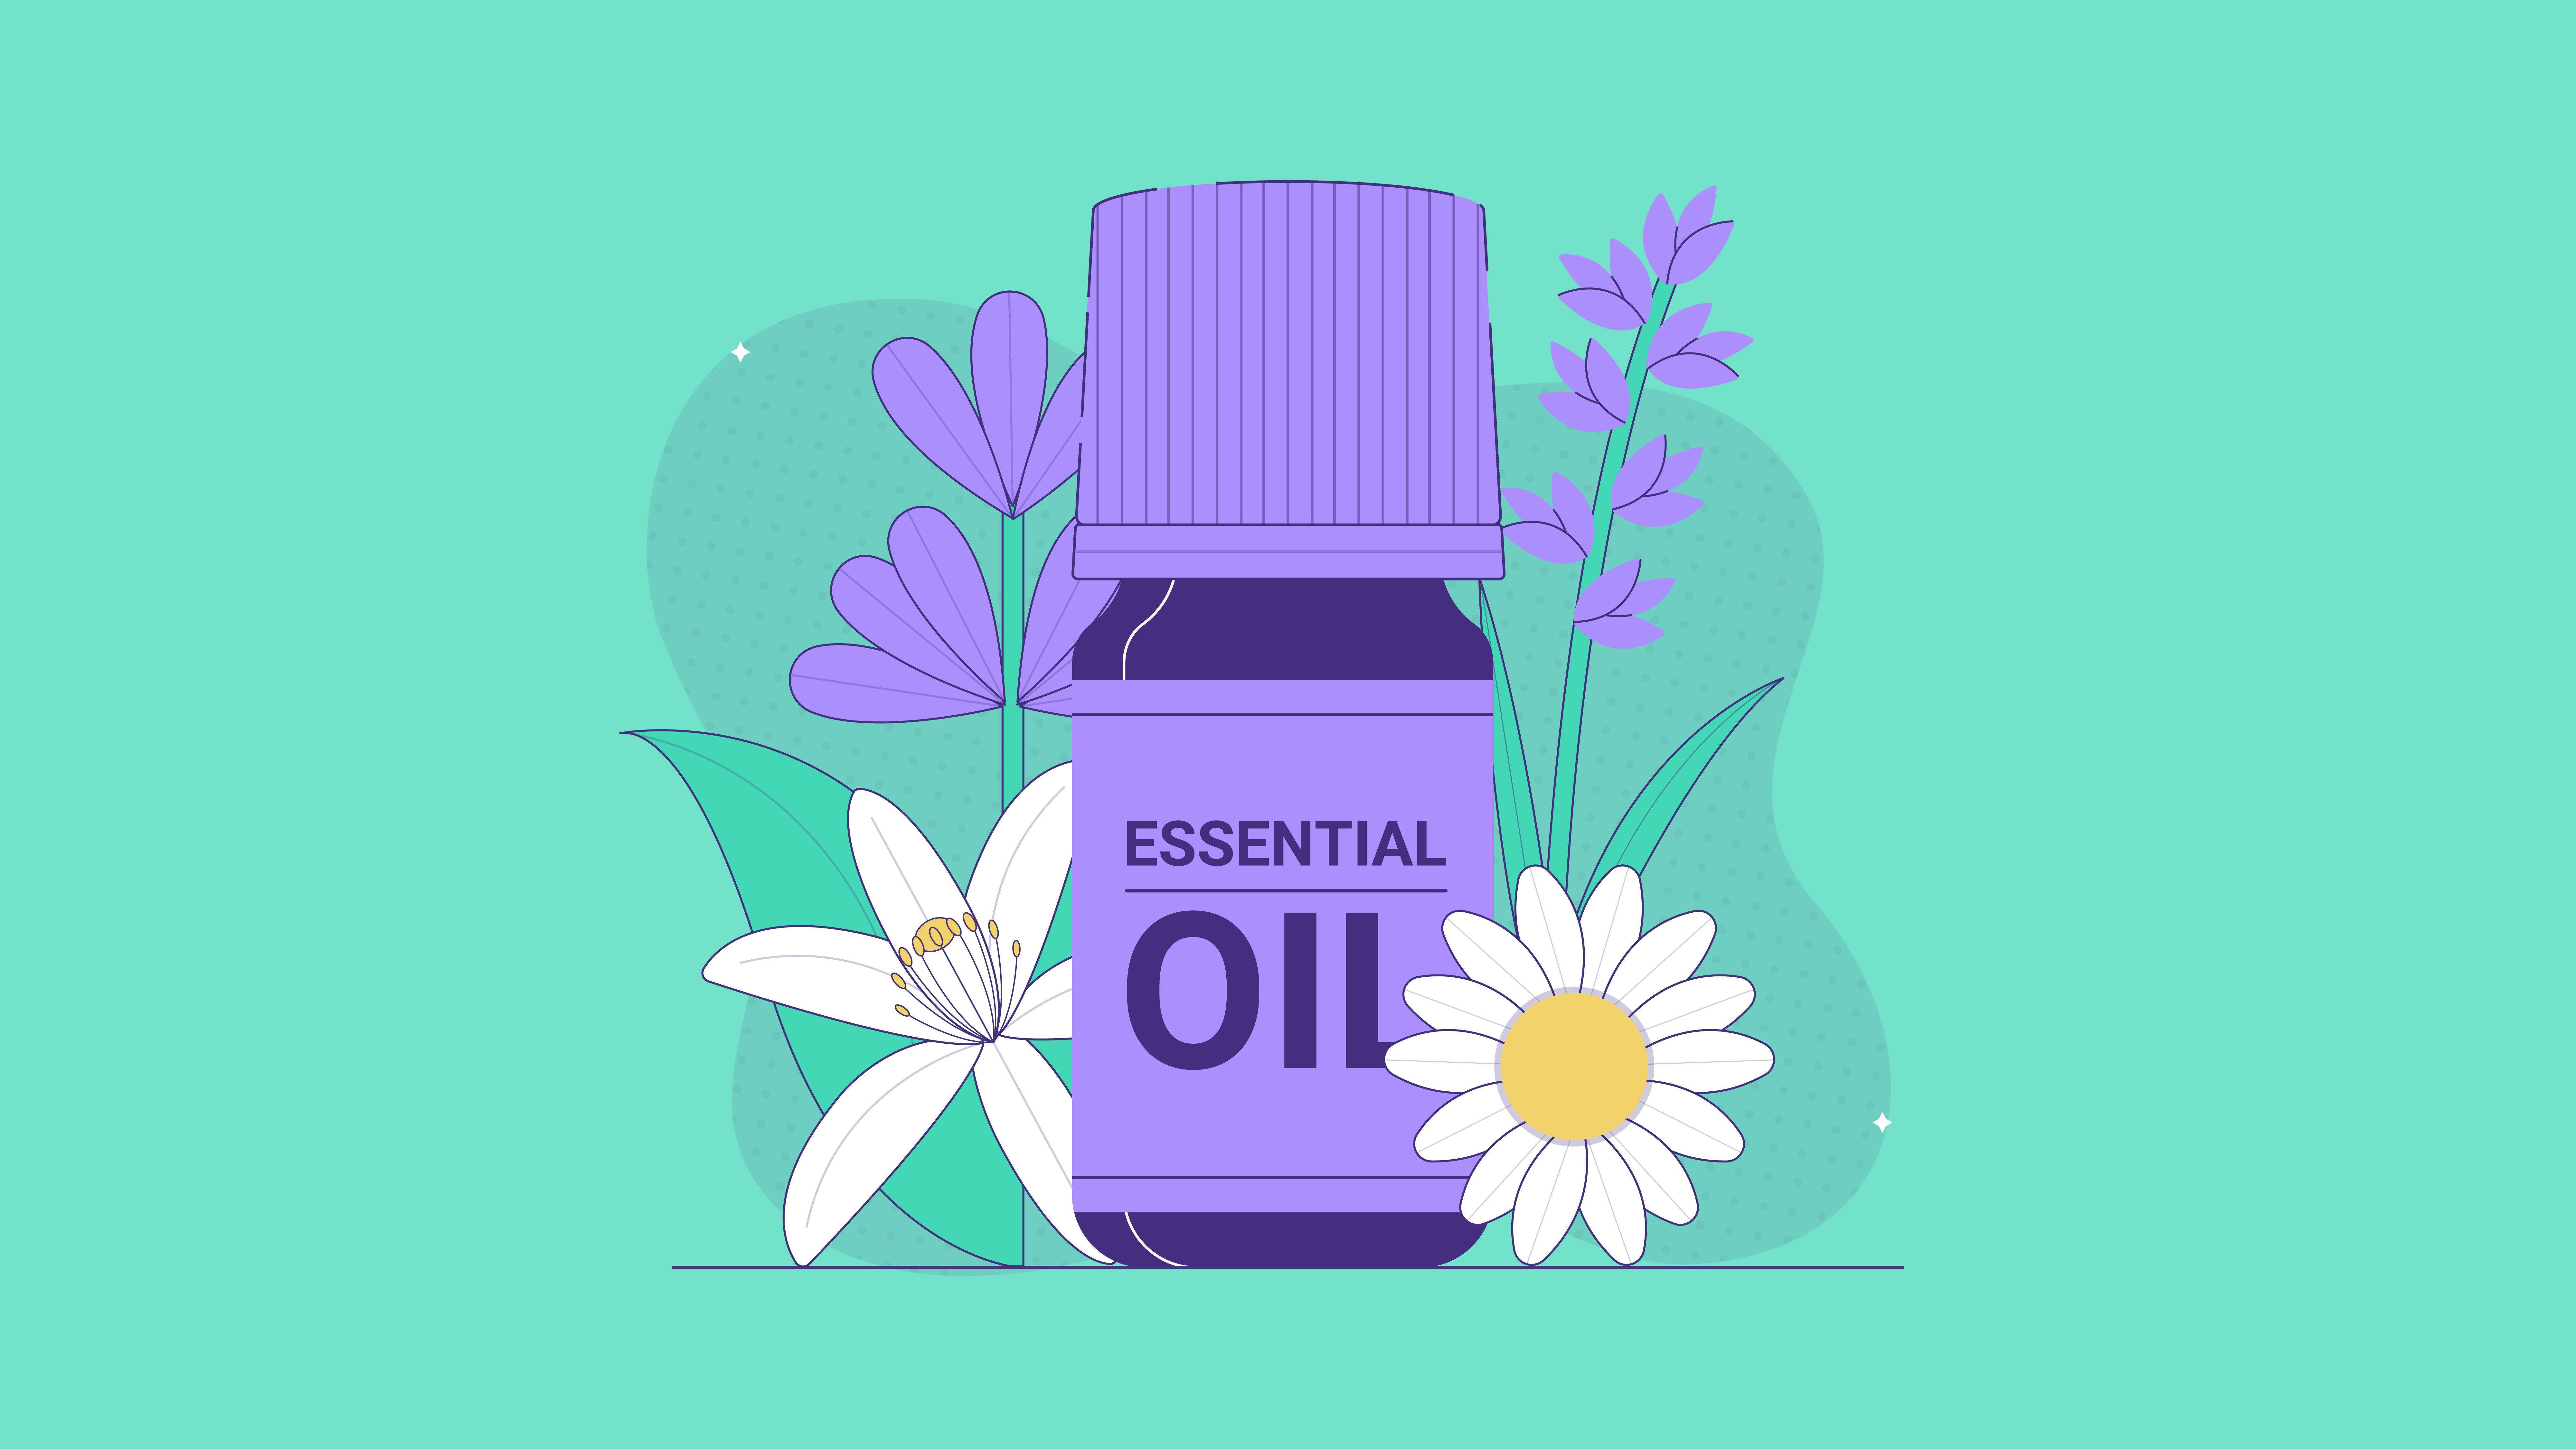 10 Best Essential Oils for Sleep